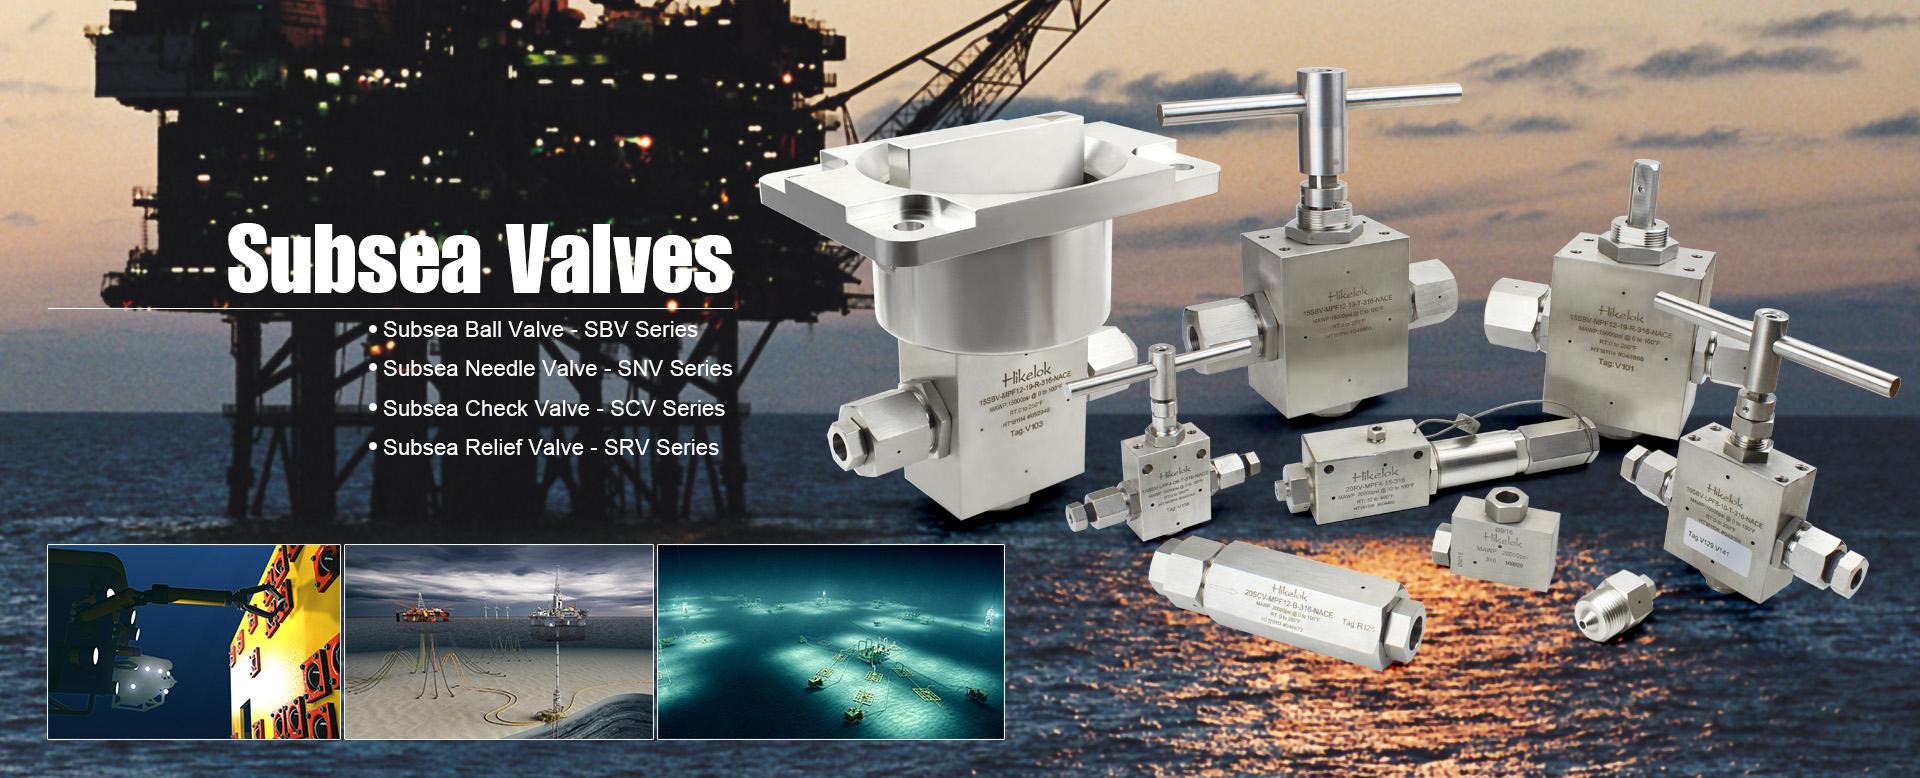 Subsea Valves